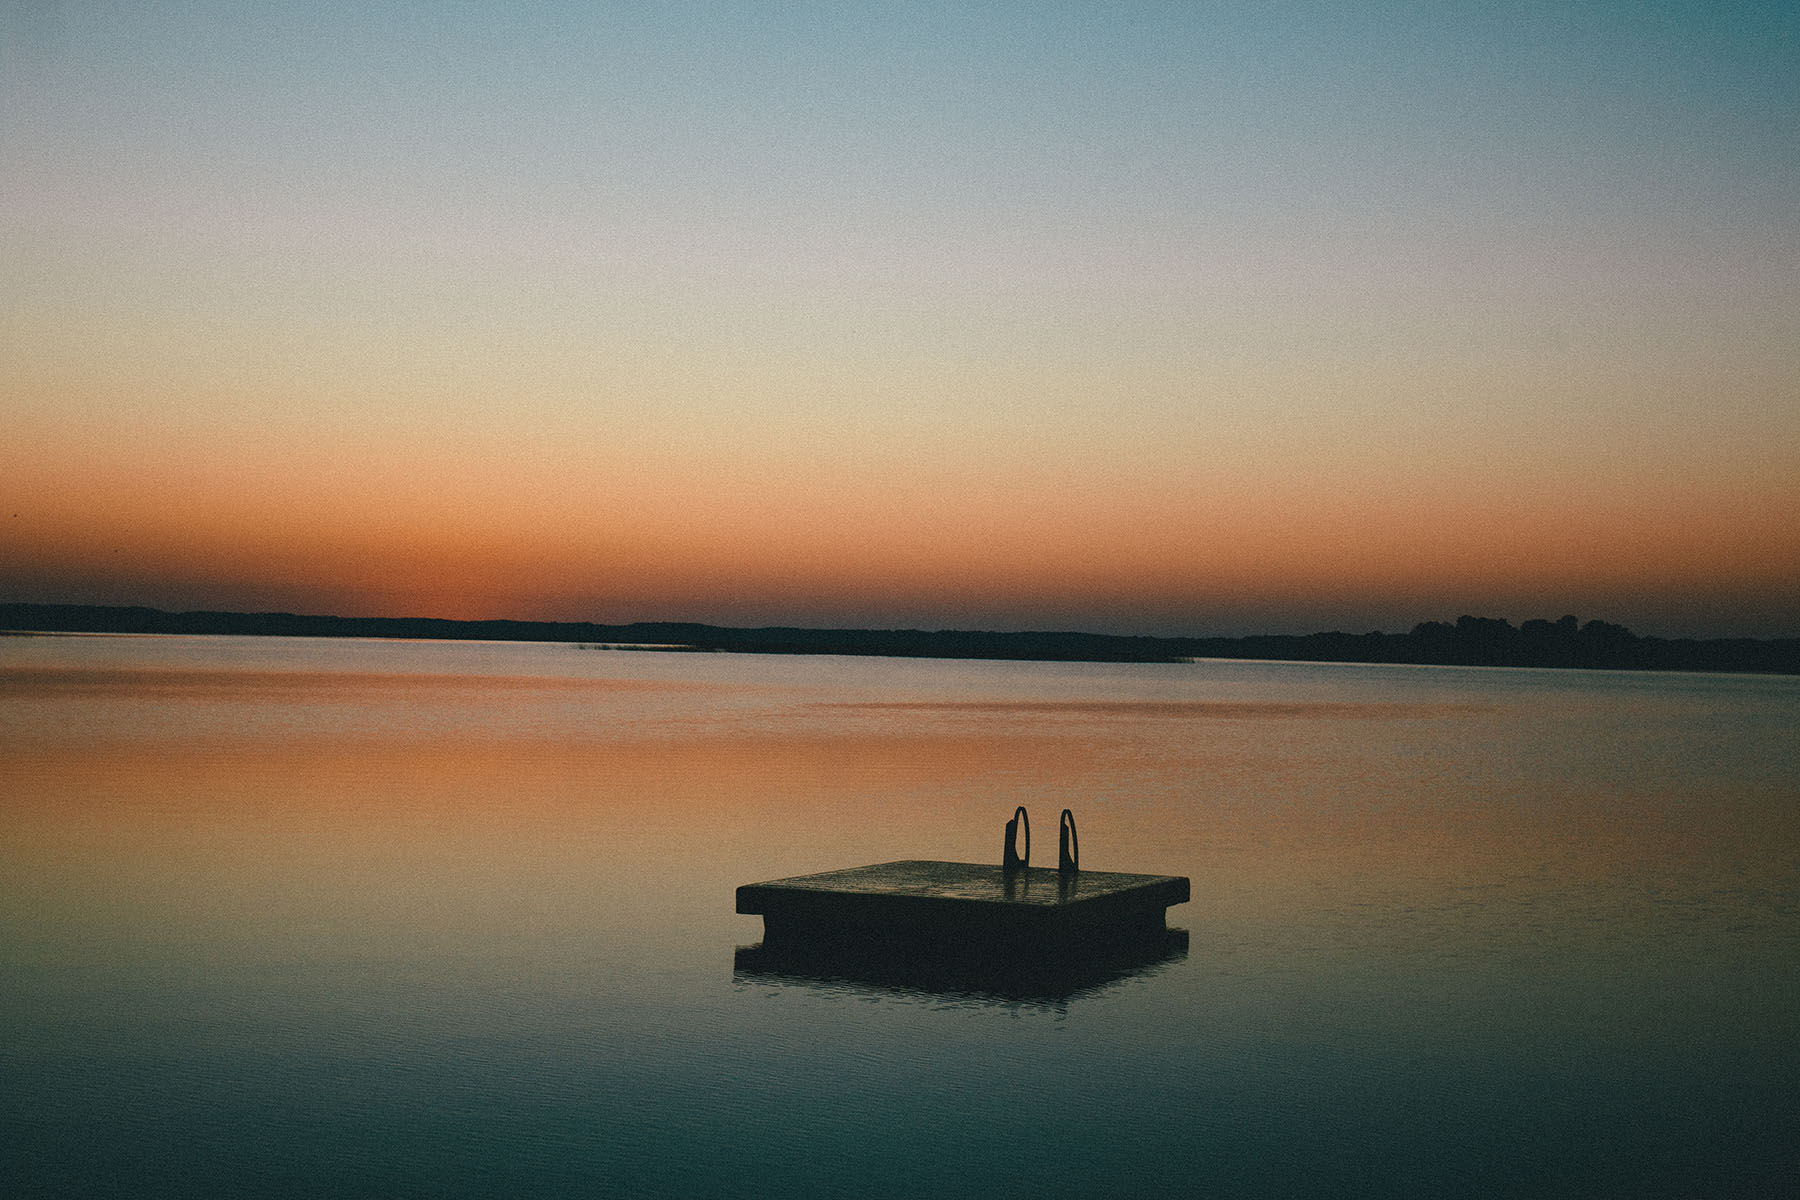 Jacob's Cove, Lake Lida, MN - Summer 2018